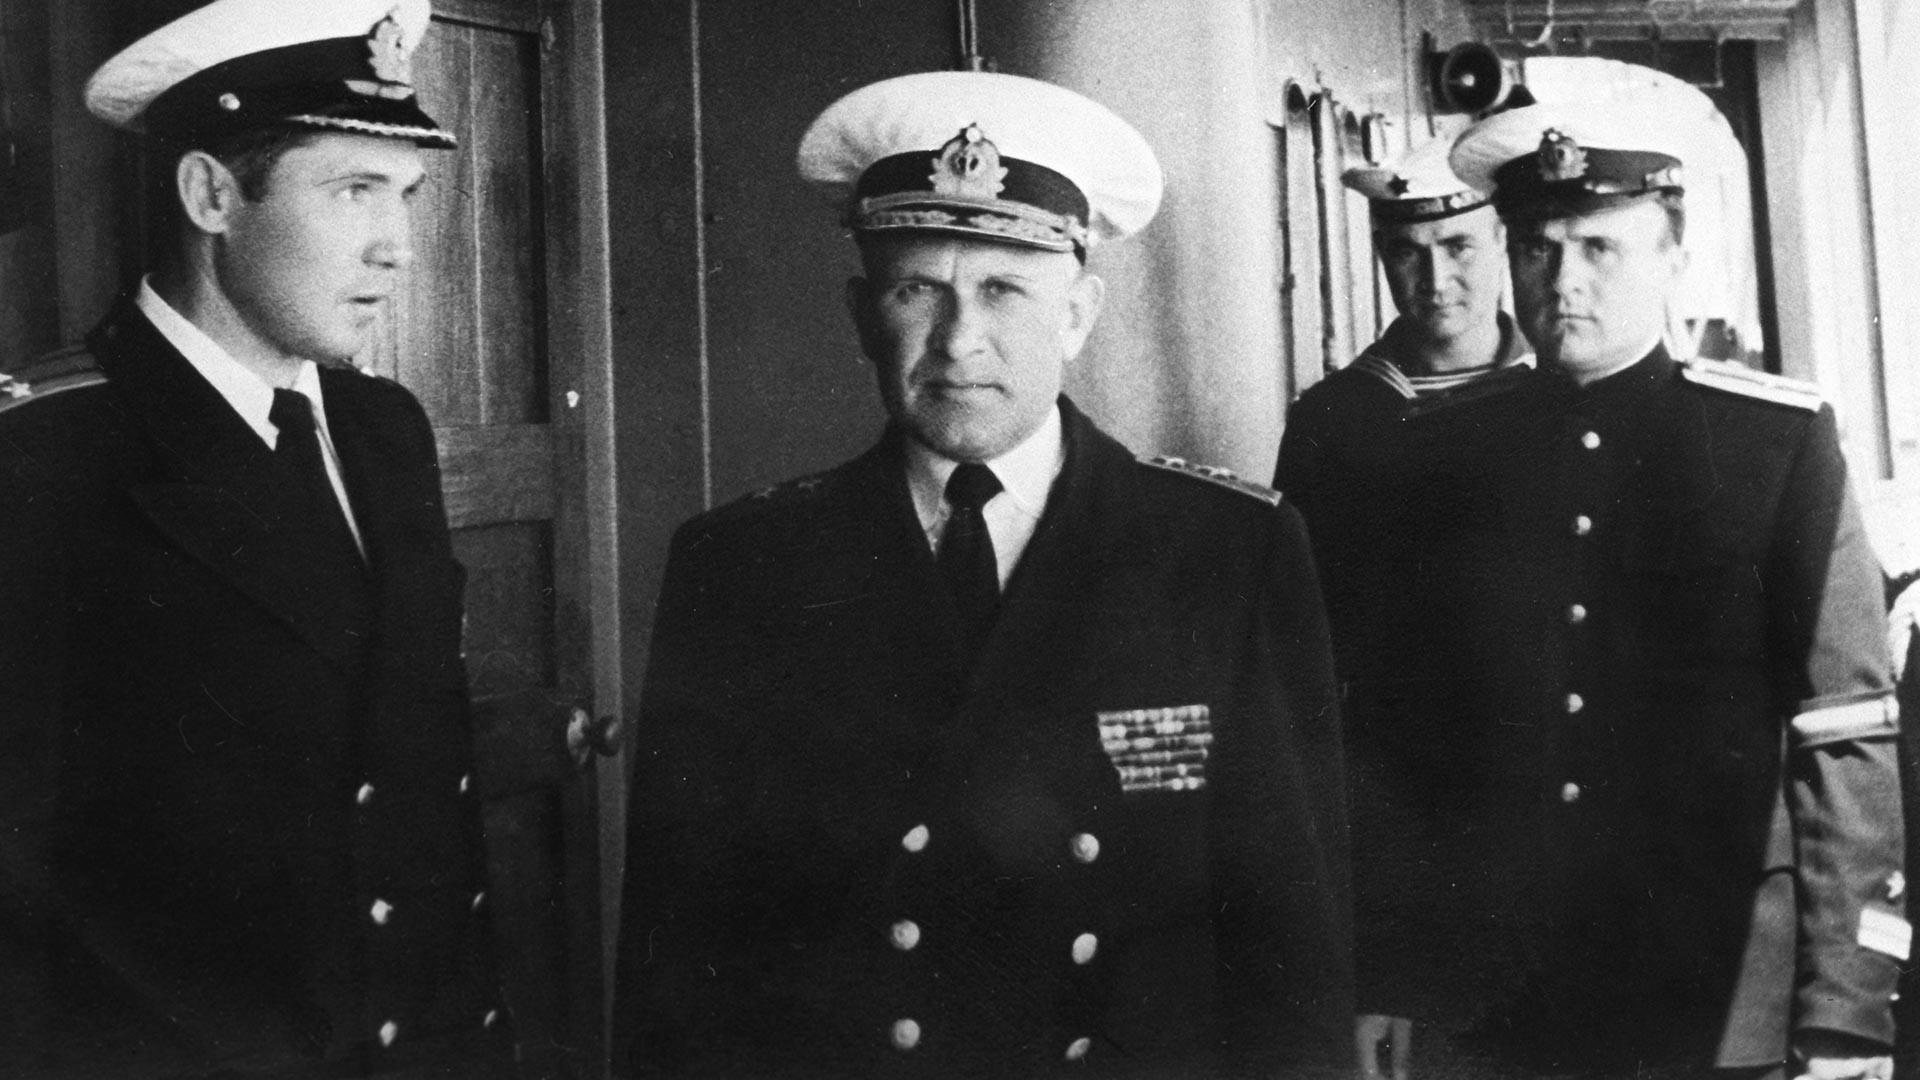 Al centro, l'ammiraglio sovietico Sergej Gorshkov